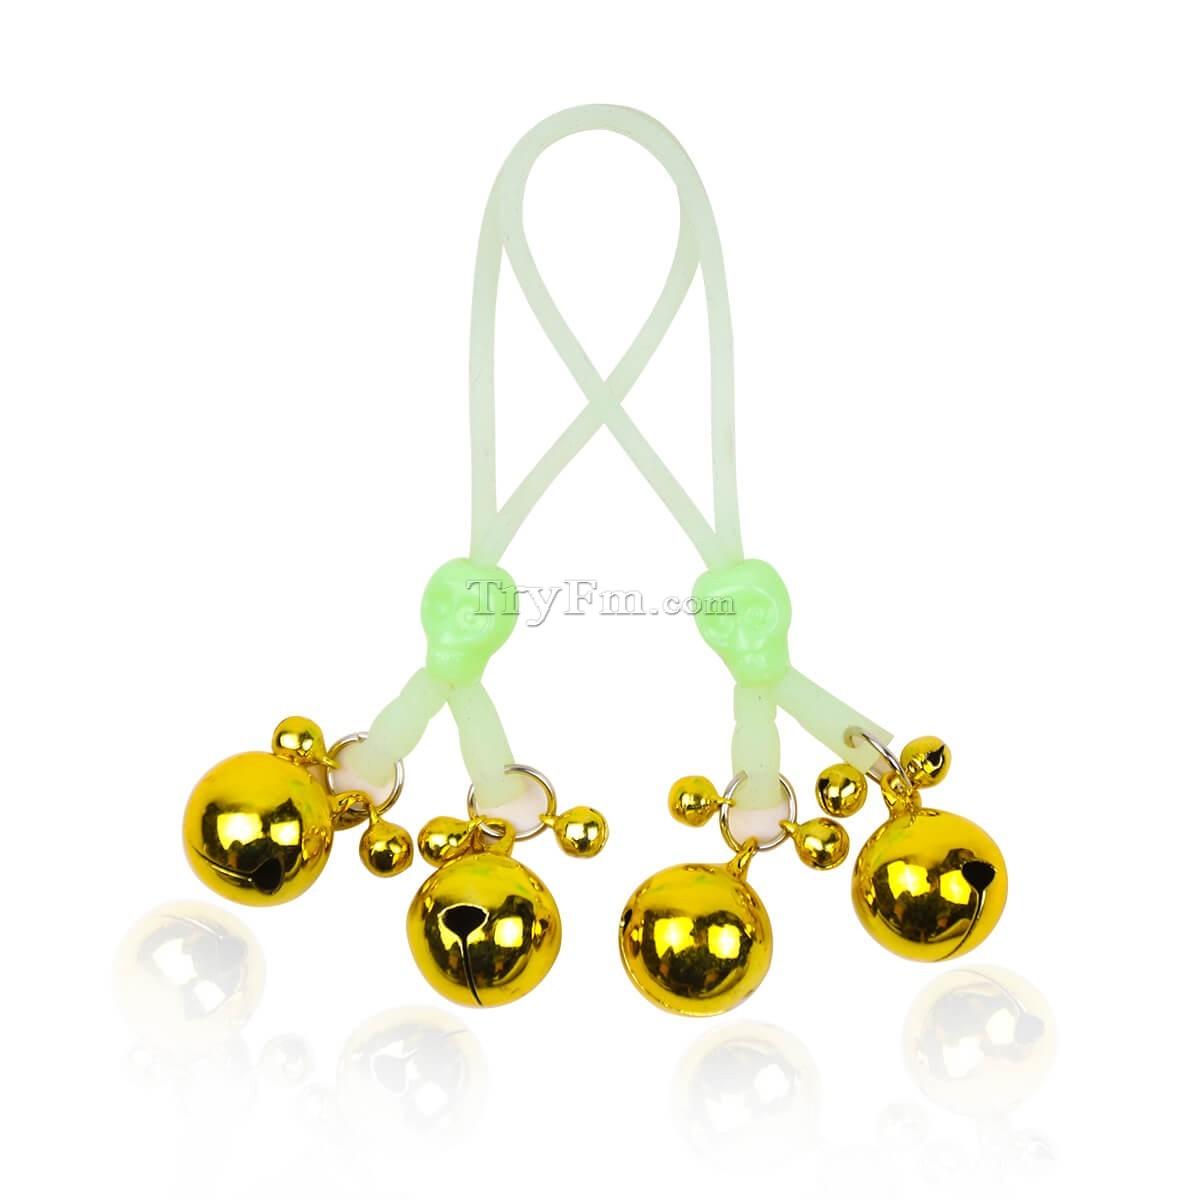 8-Bell-pasties-with-night-glow-ties9.jpg